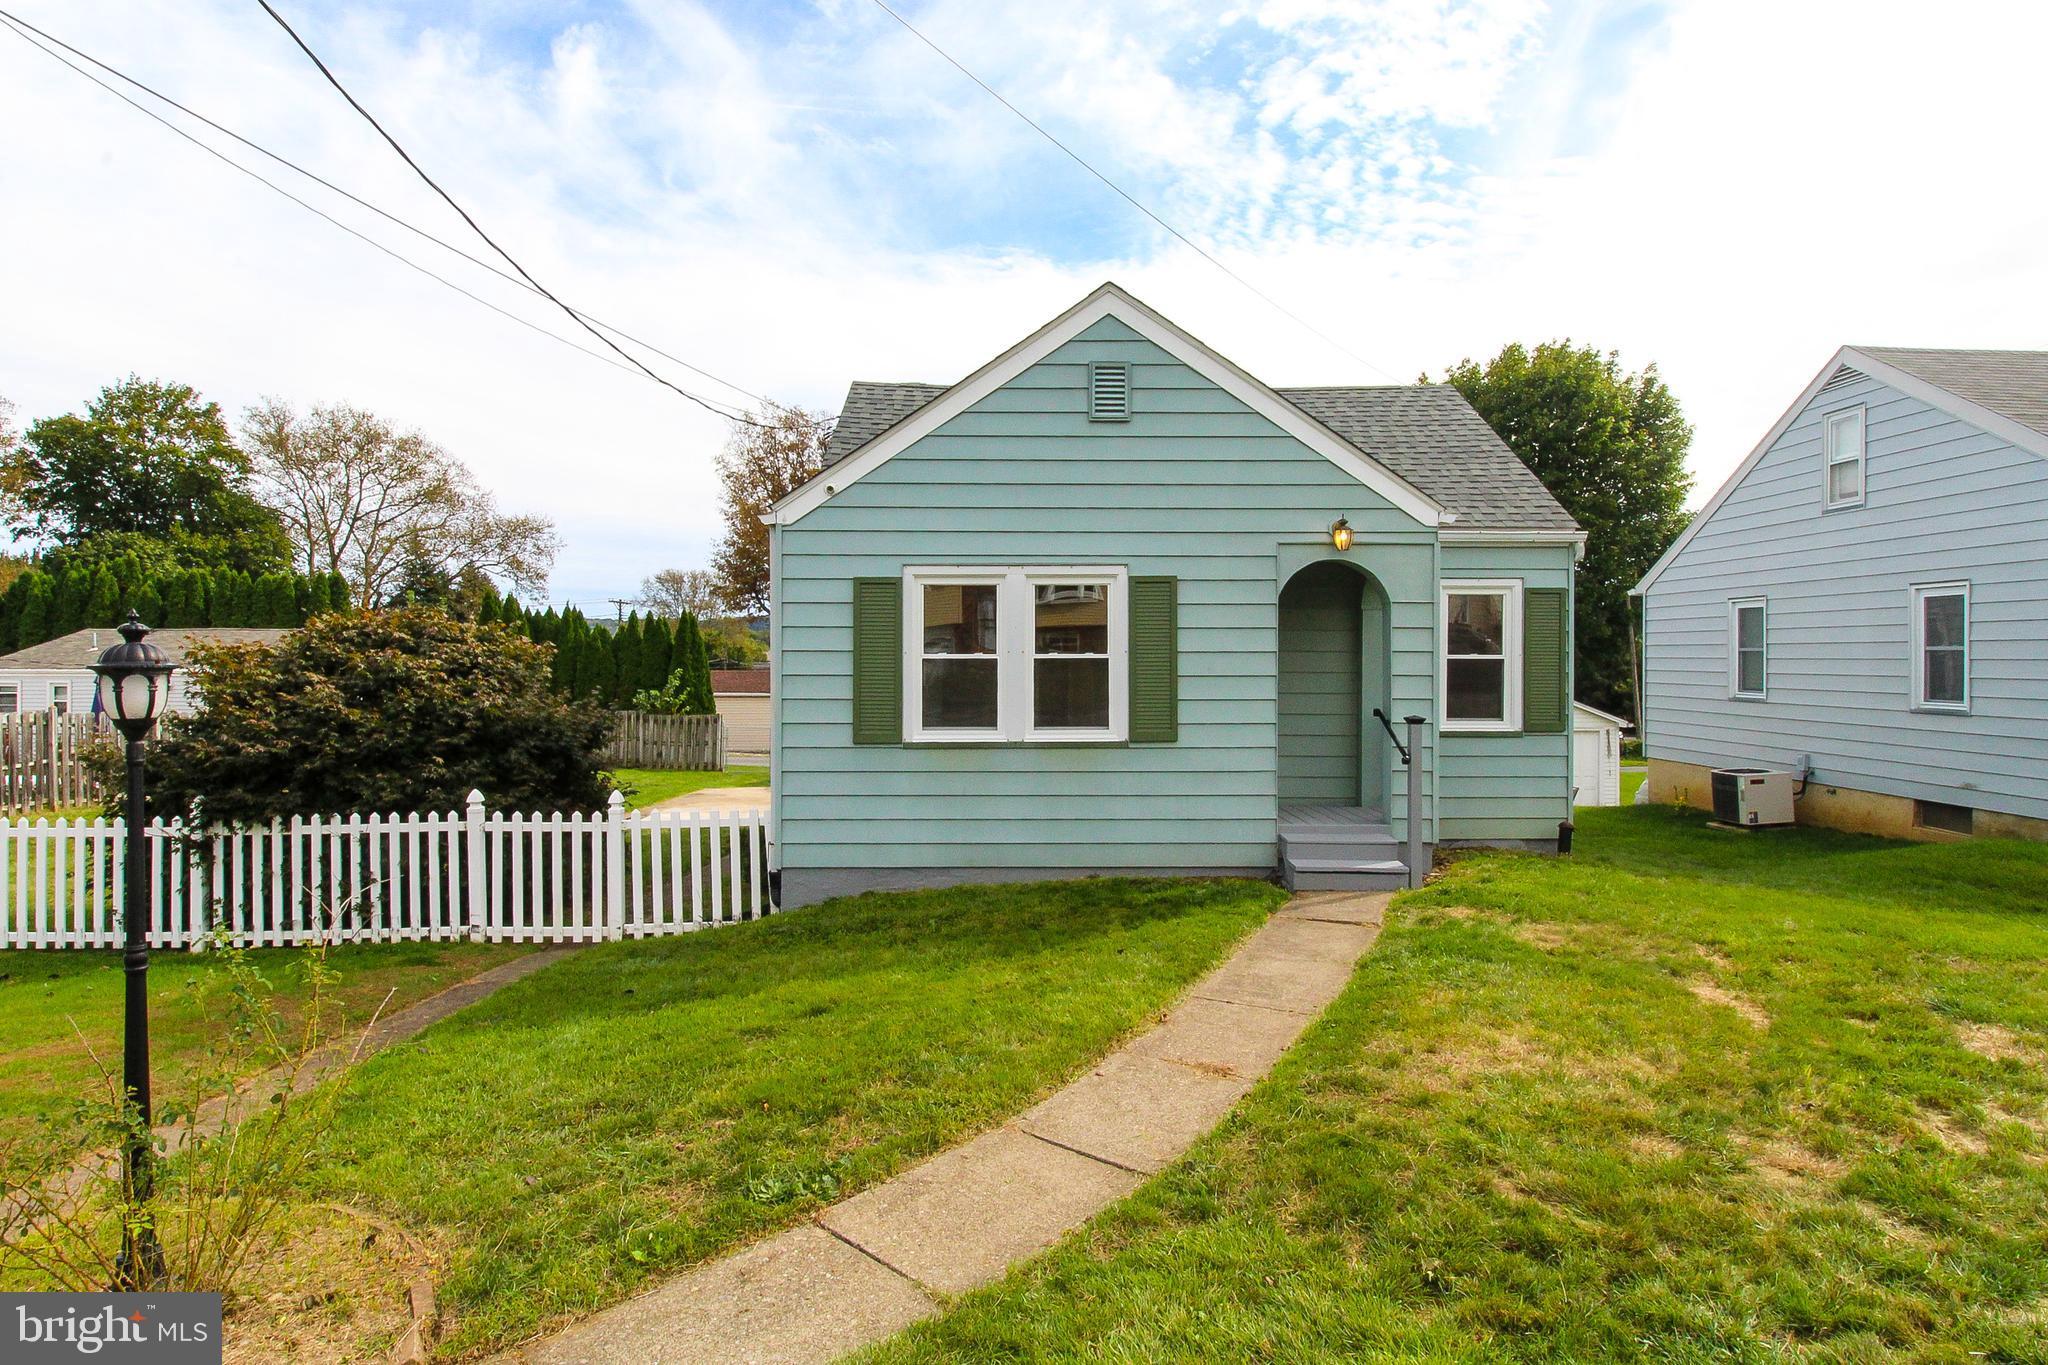 2732 OREGON STREET, EASTON, PA 18045